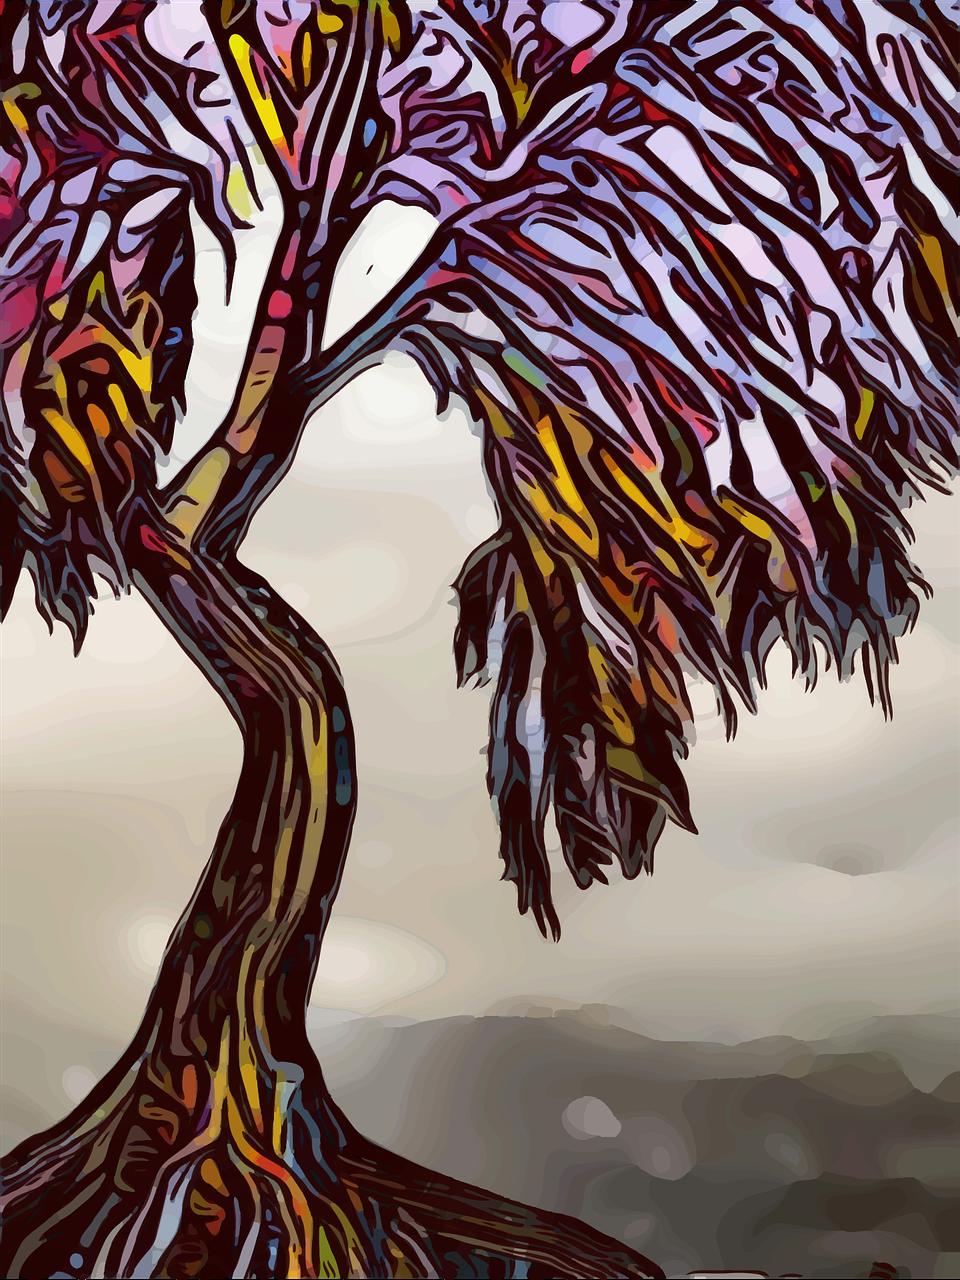 tree-3363518_1280